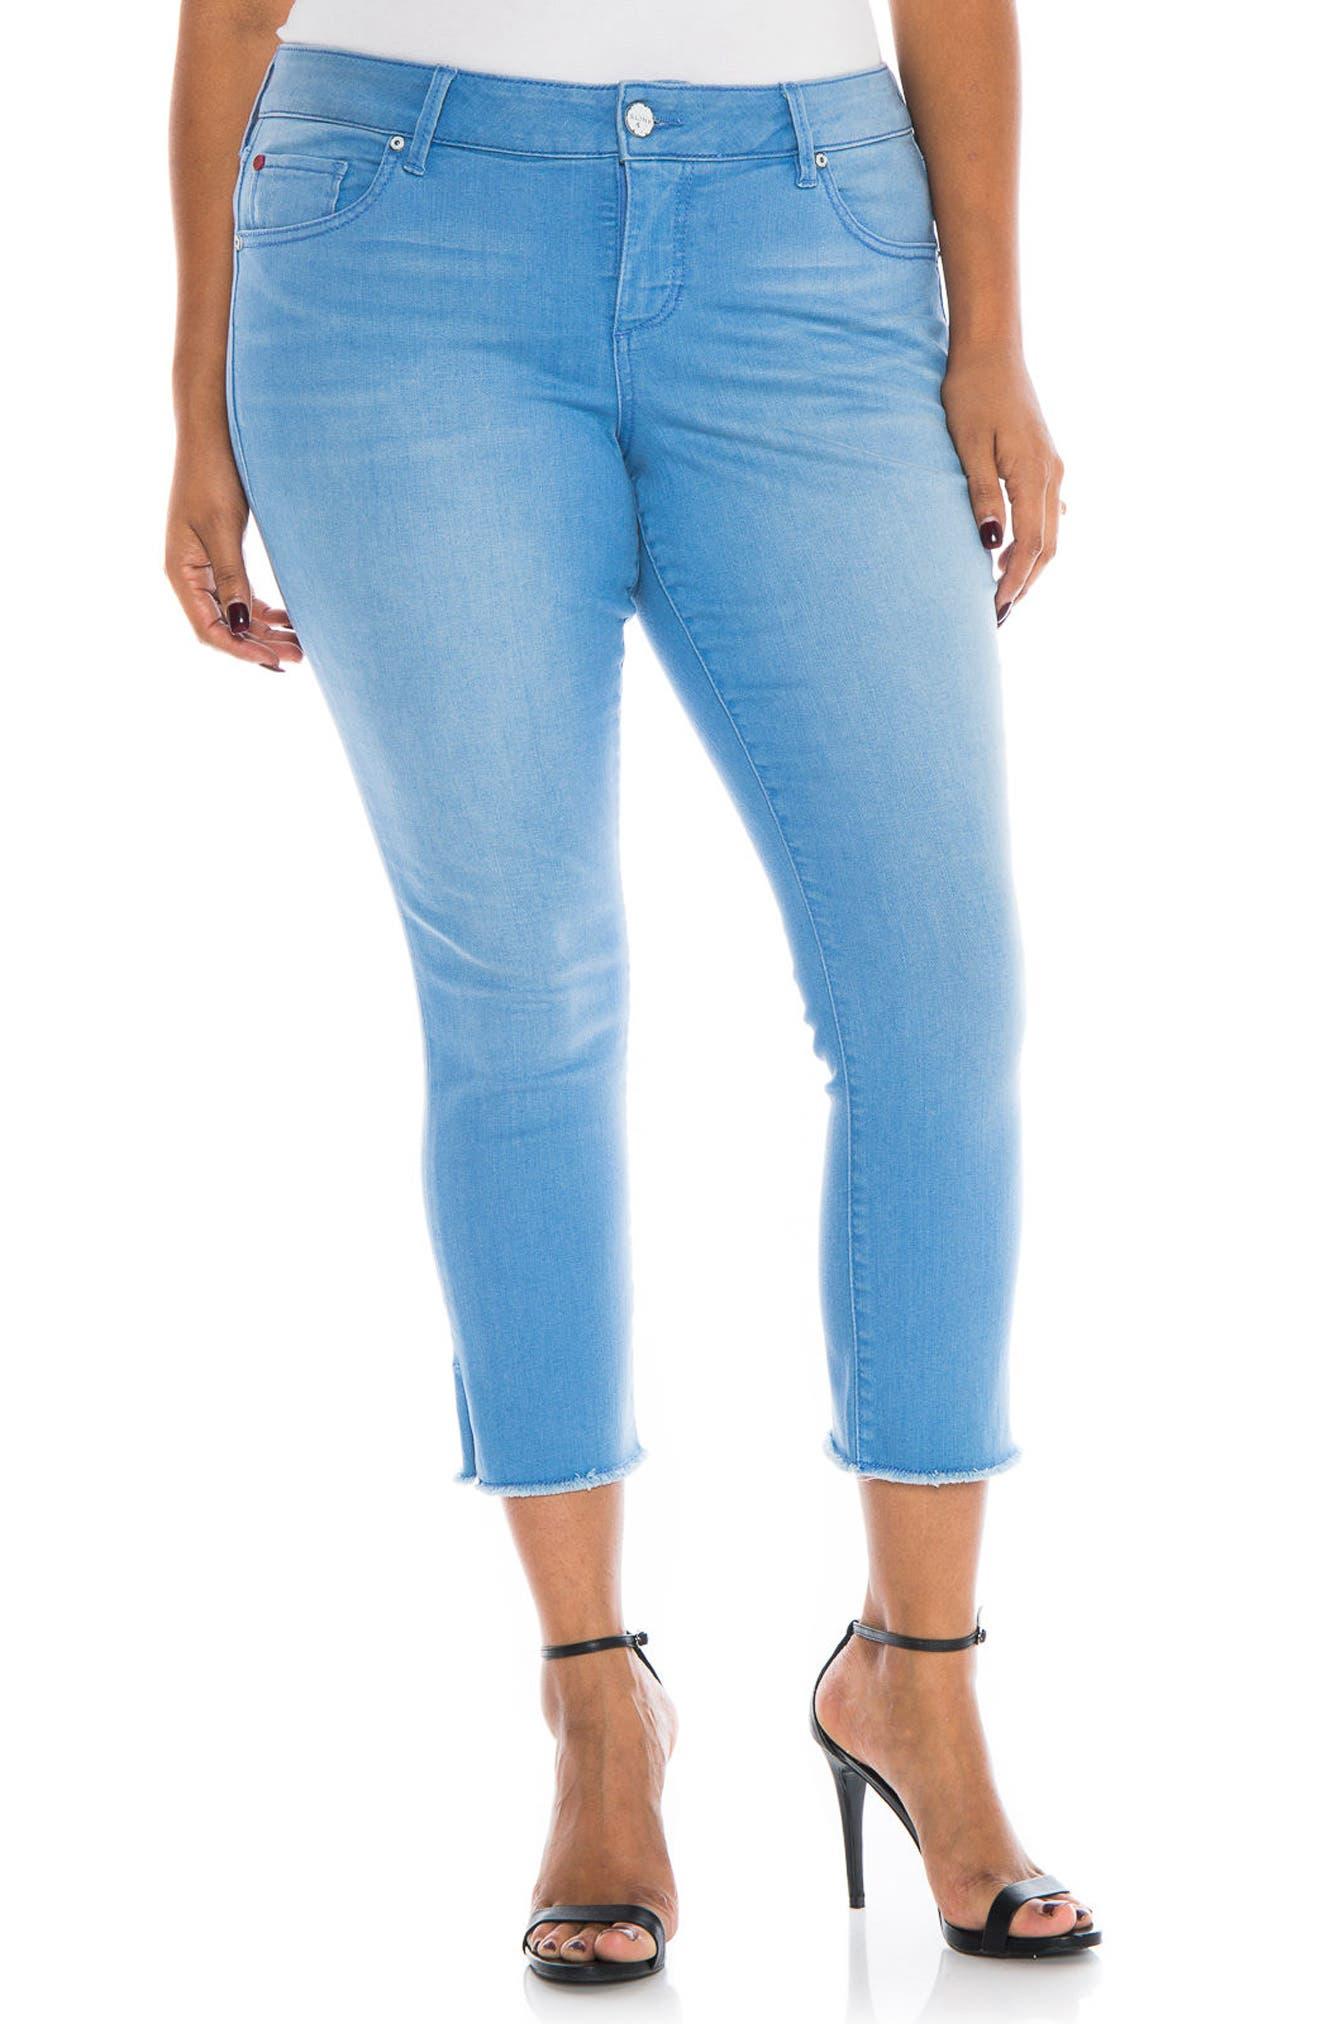 Main Image - SLINK Jeans Fray Hem Crop Skinny Jeans (Cloe) (Plus Size)